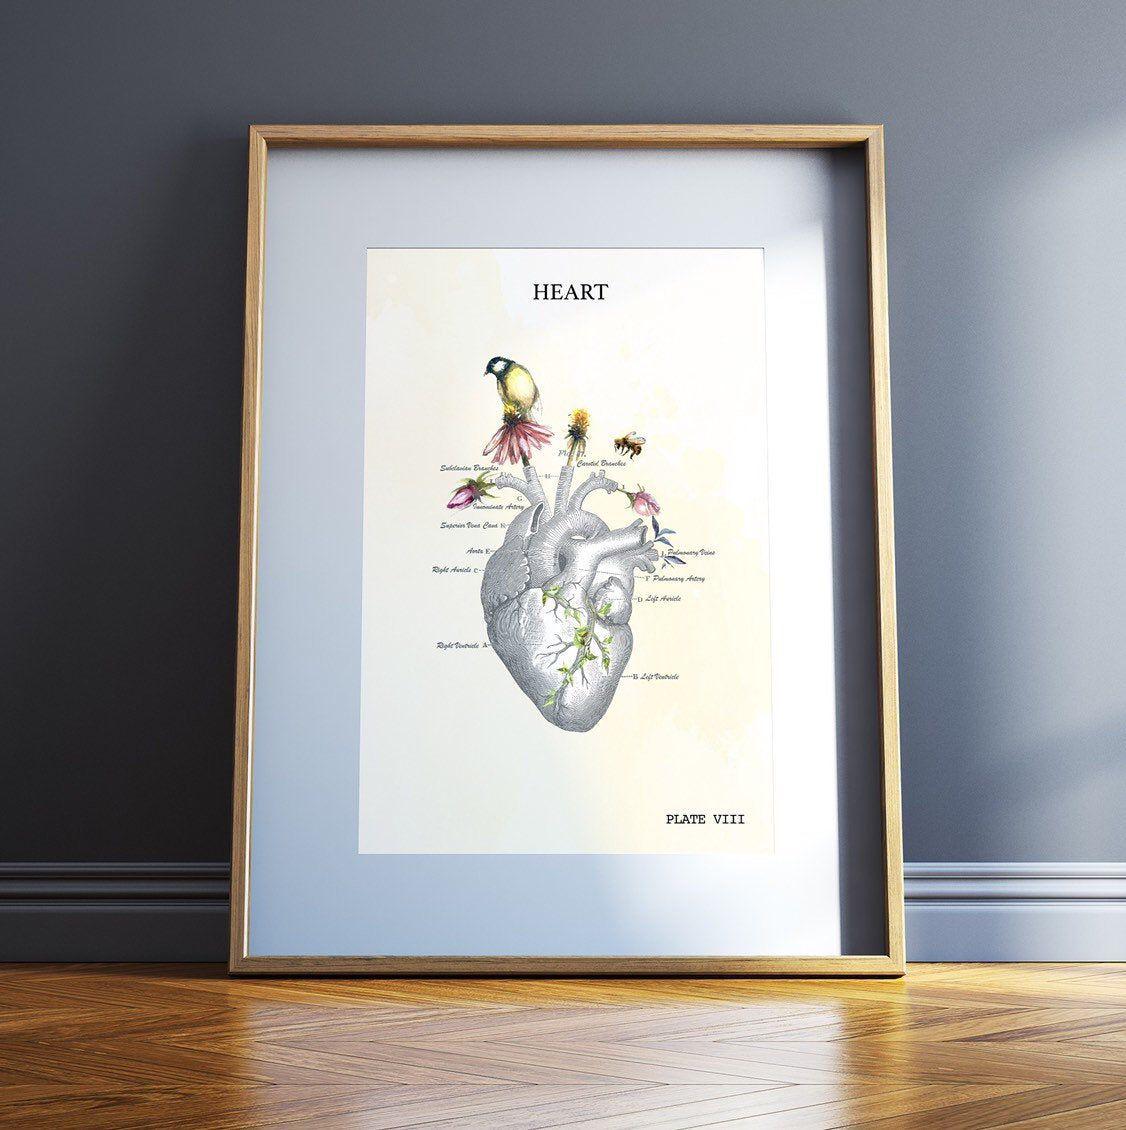 Graduation Gift for Nurse Medical Assistant Gifts Anatomical Heart Art Print Medical Student Graduation Gift for EKG technician Cardiology #medicalstudents